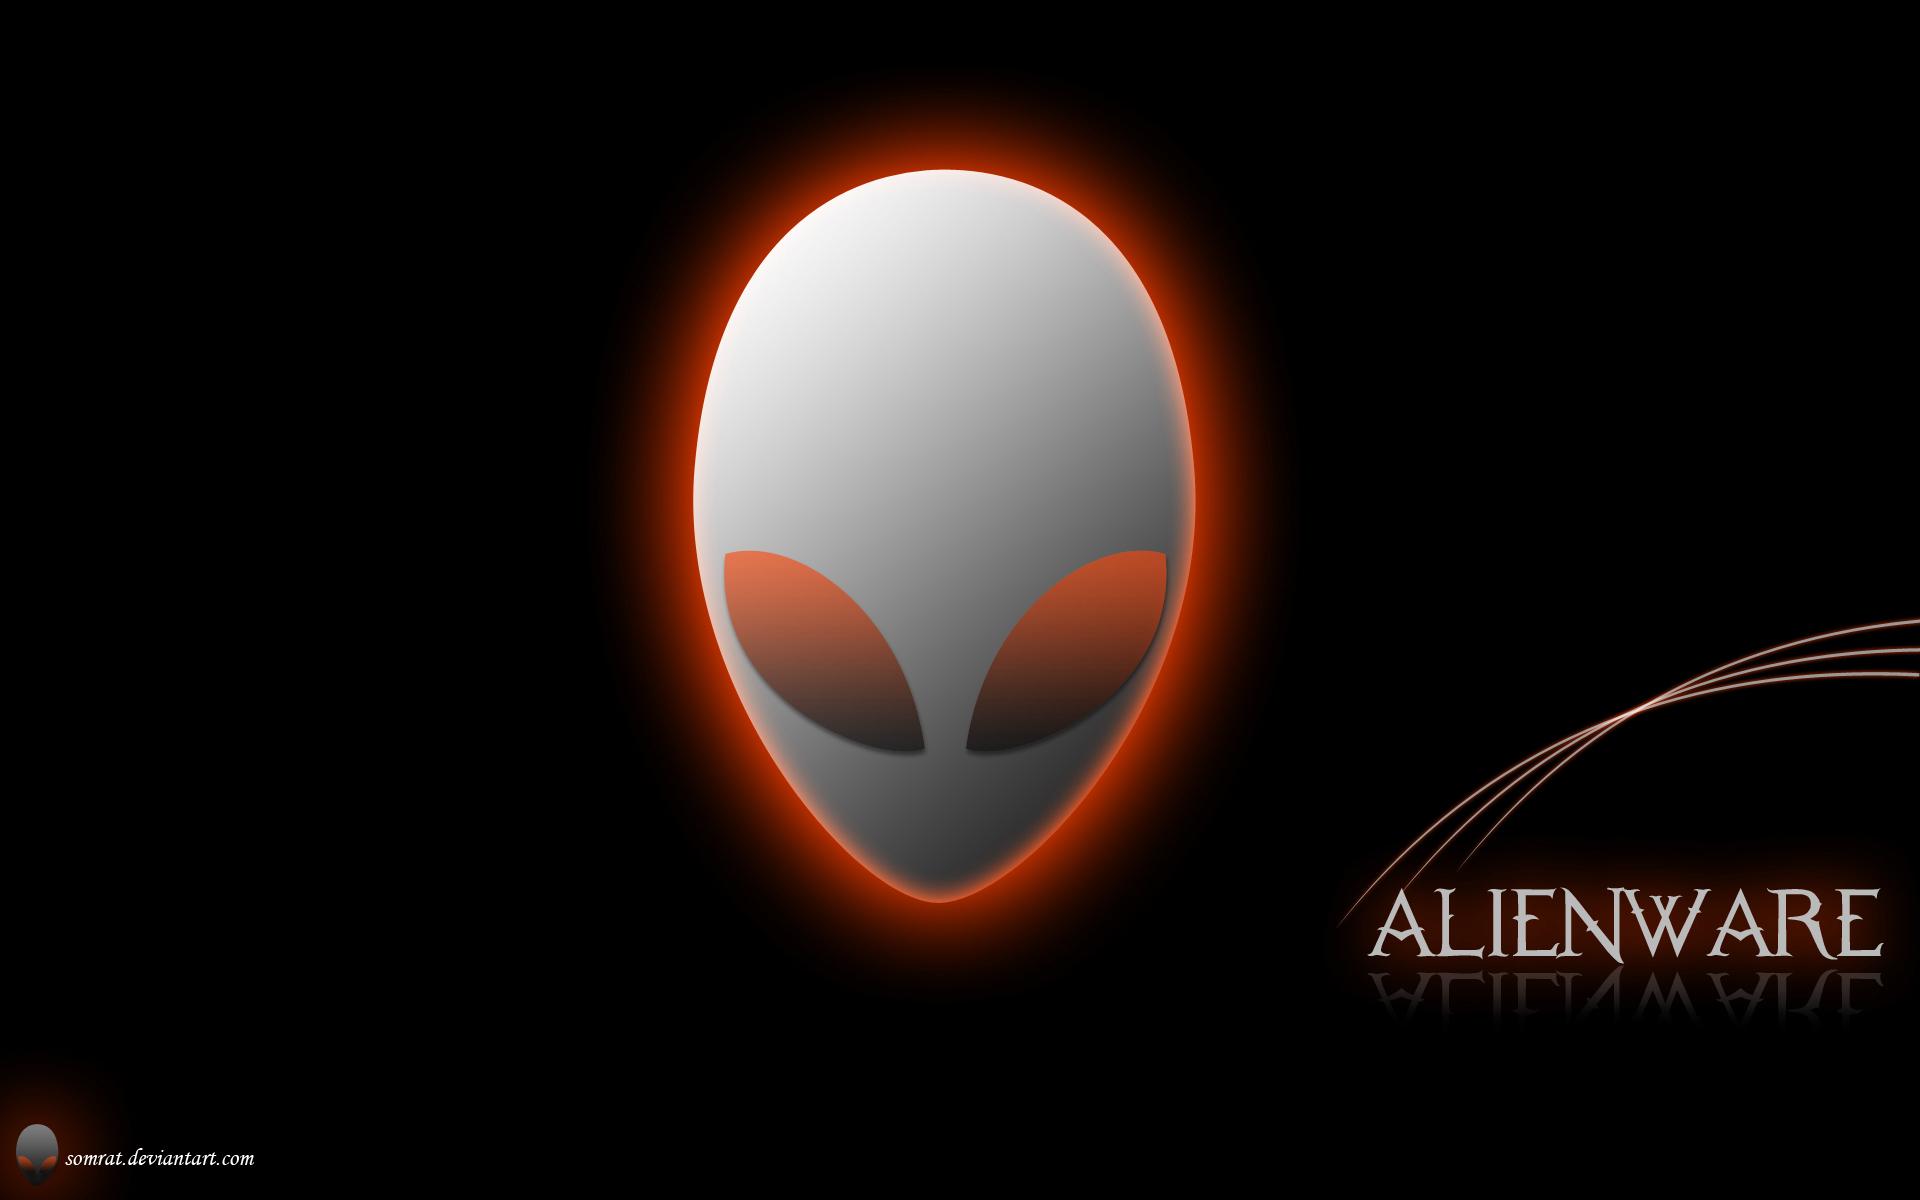 Alienware Orange Eyes Wallpapers Collection 15 Wallpapers